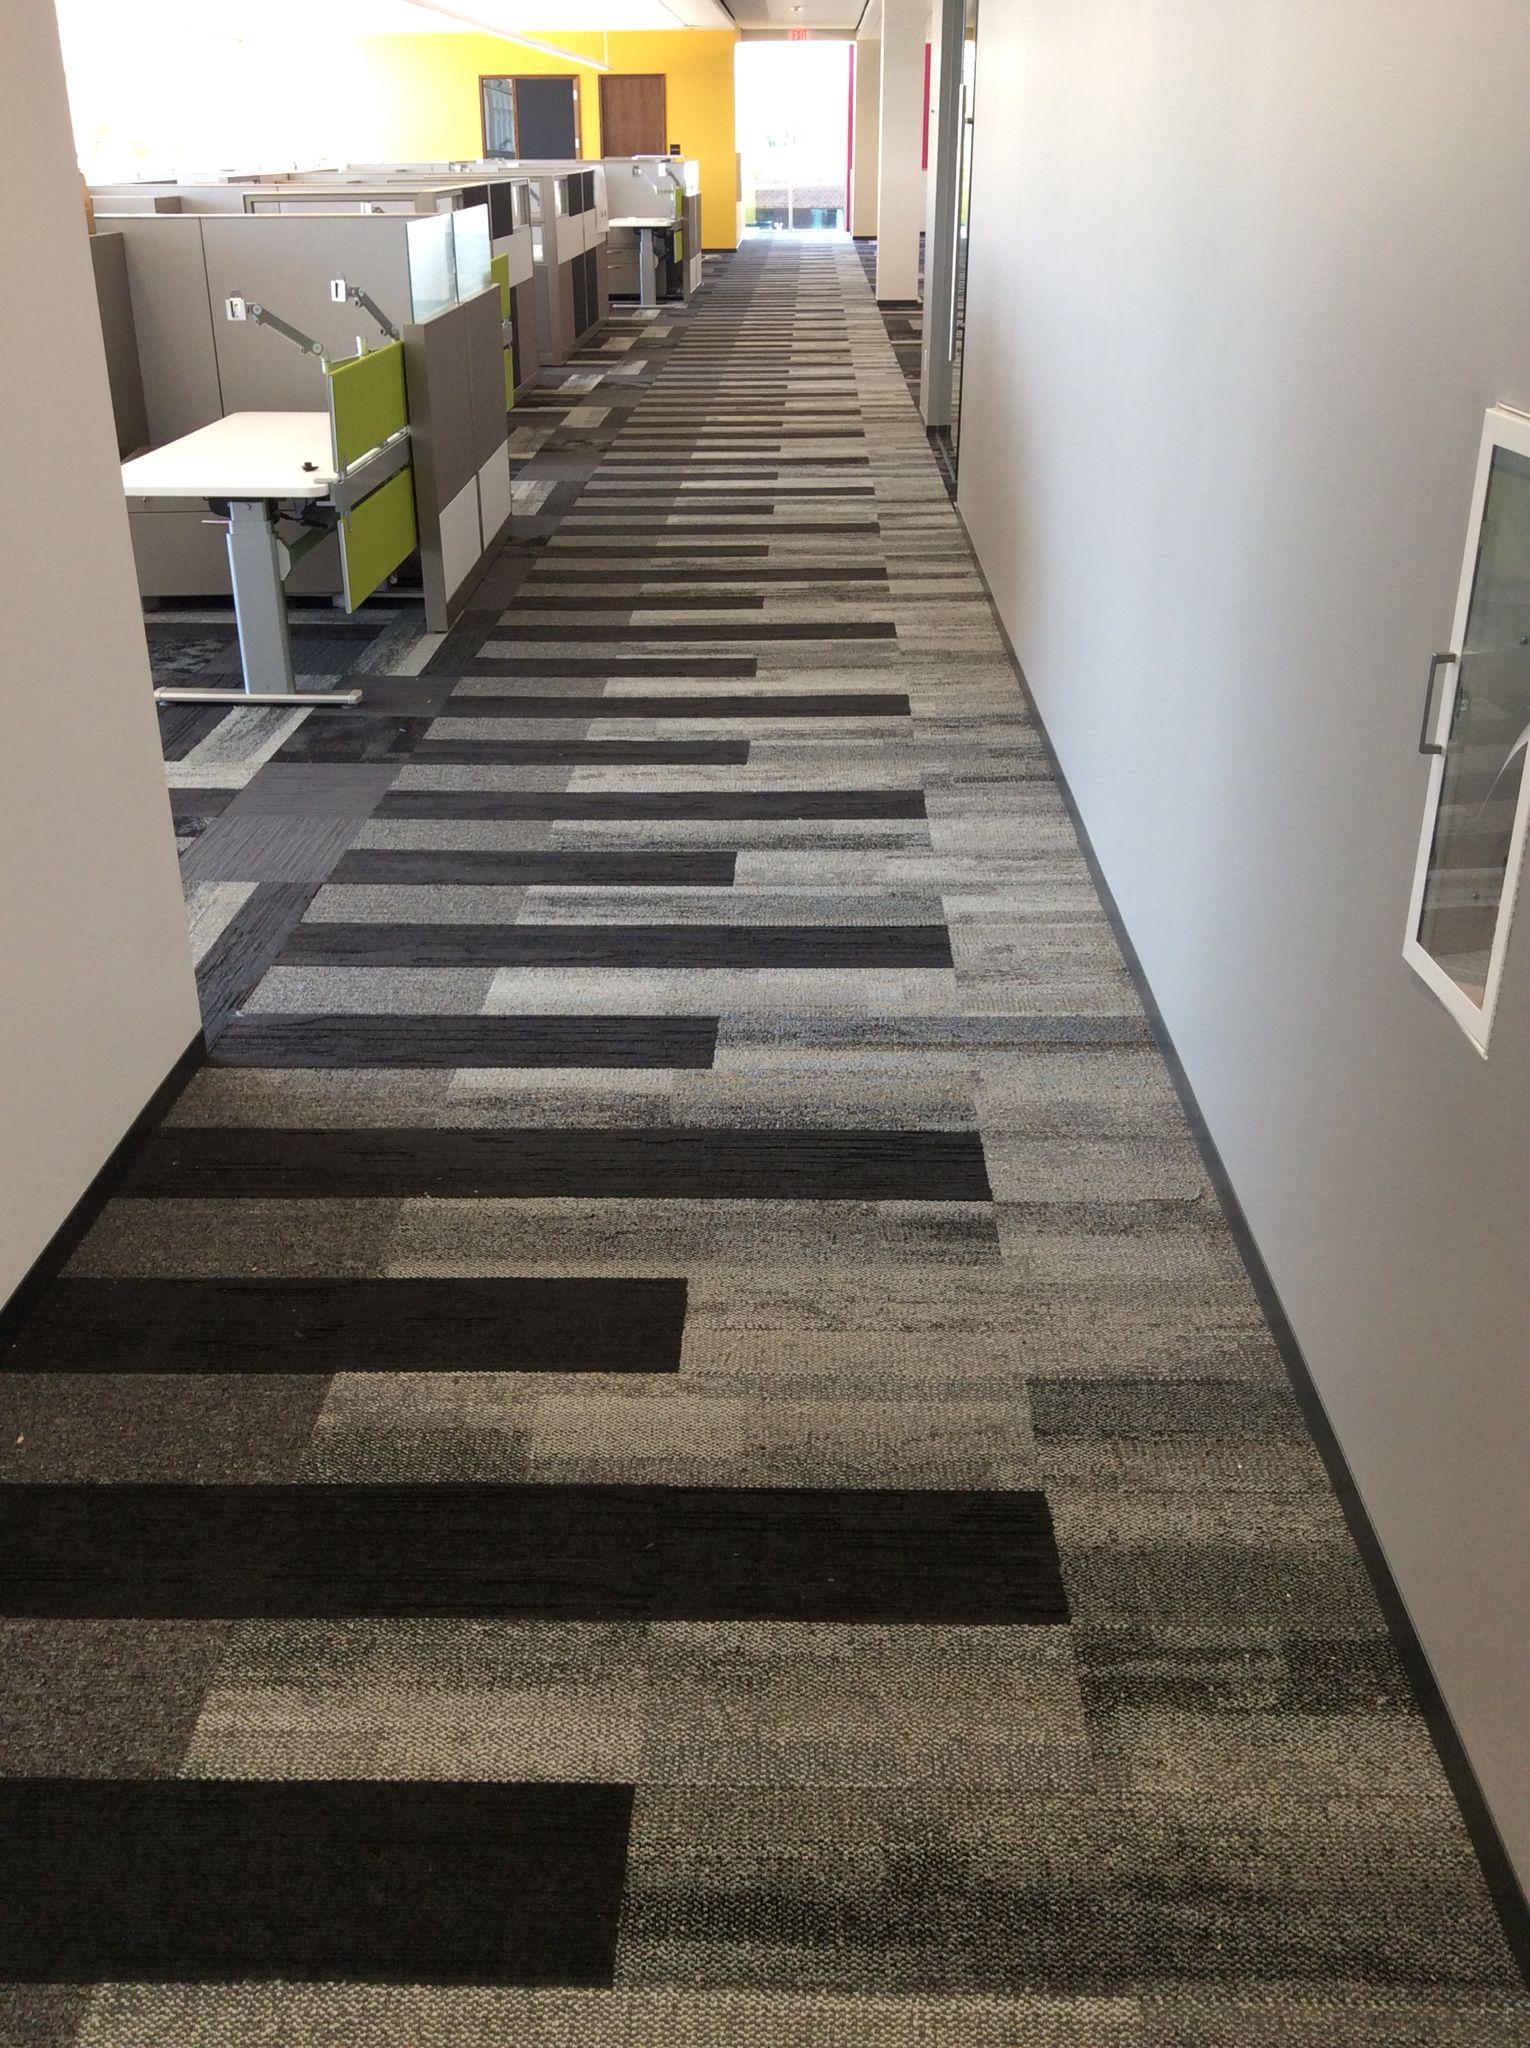 Interface Piano Key Install Carpet Tiles Office Design